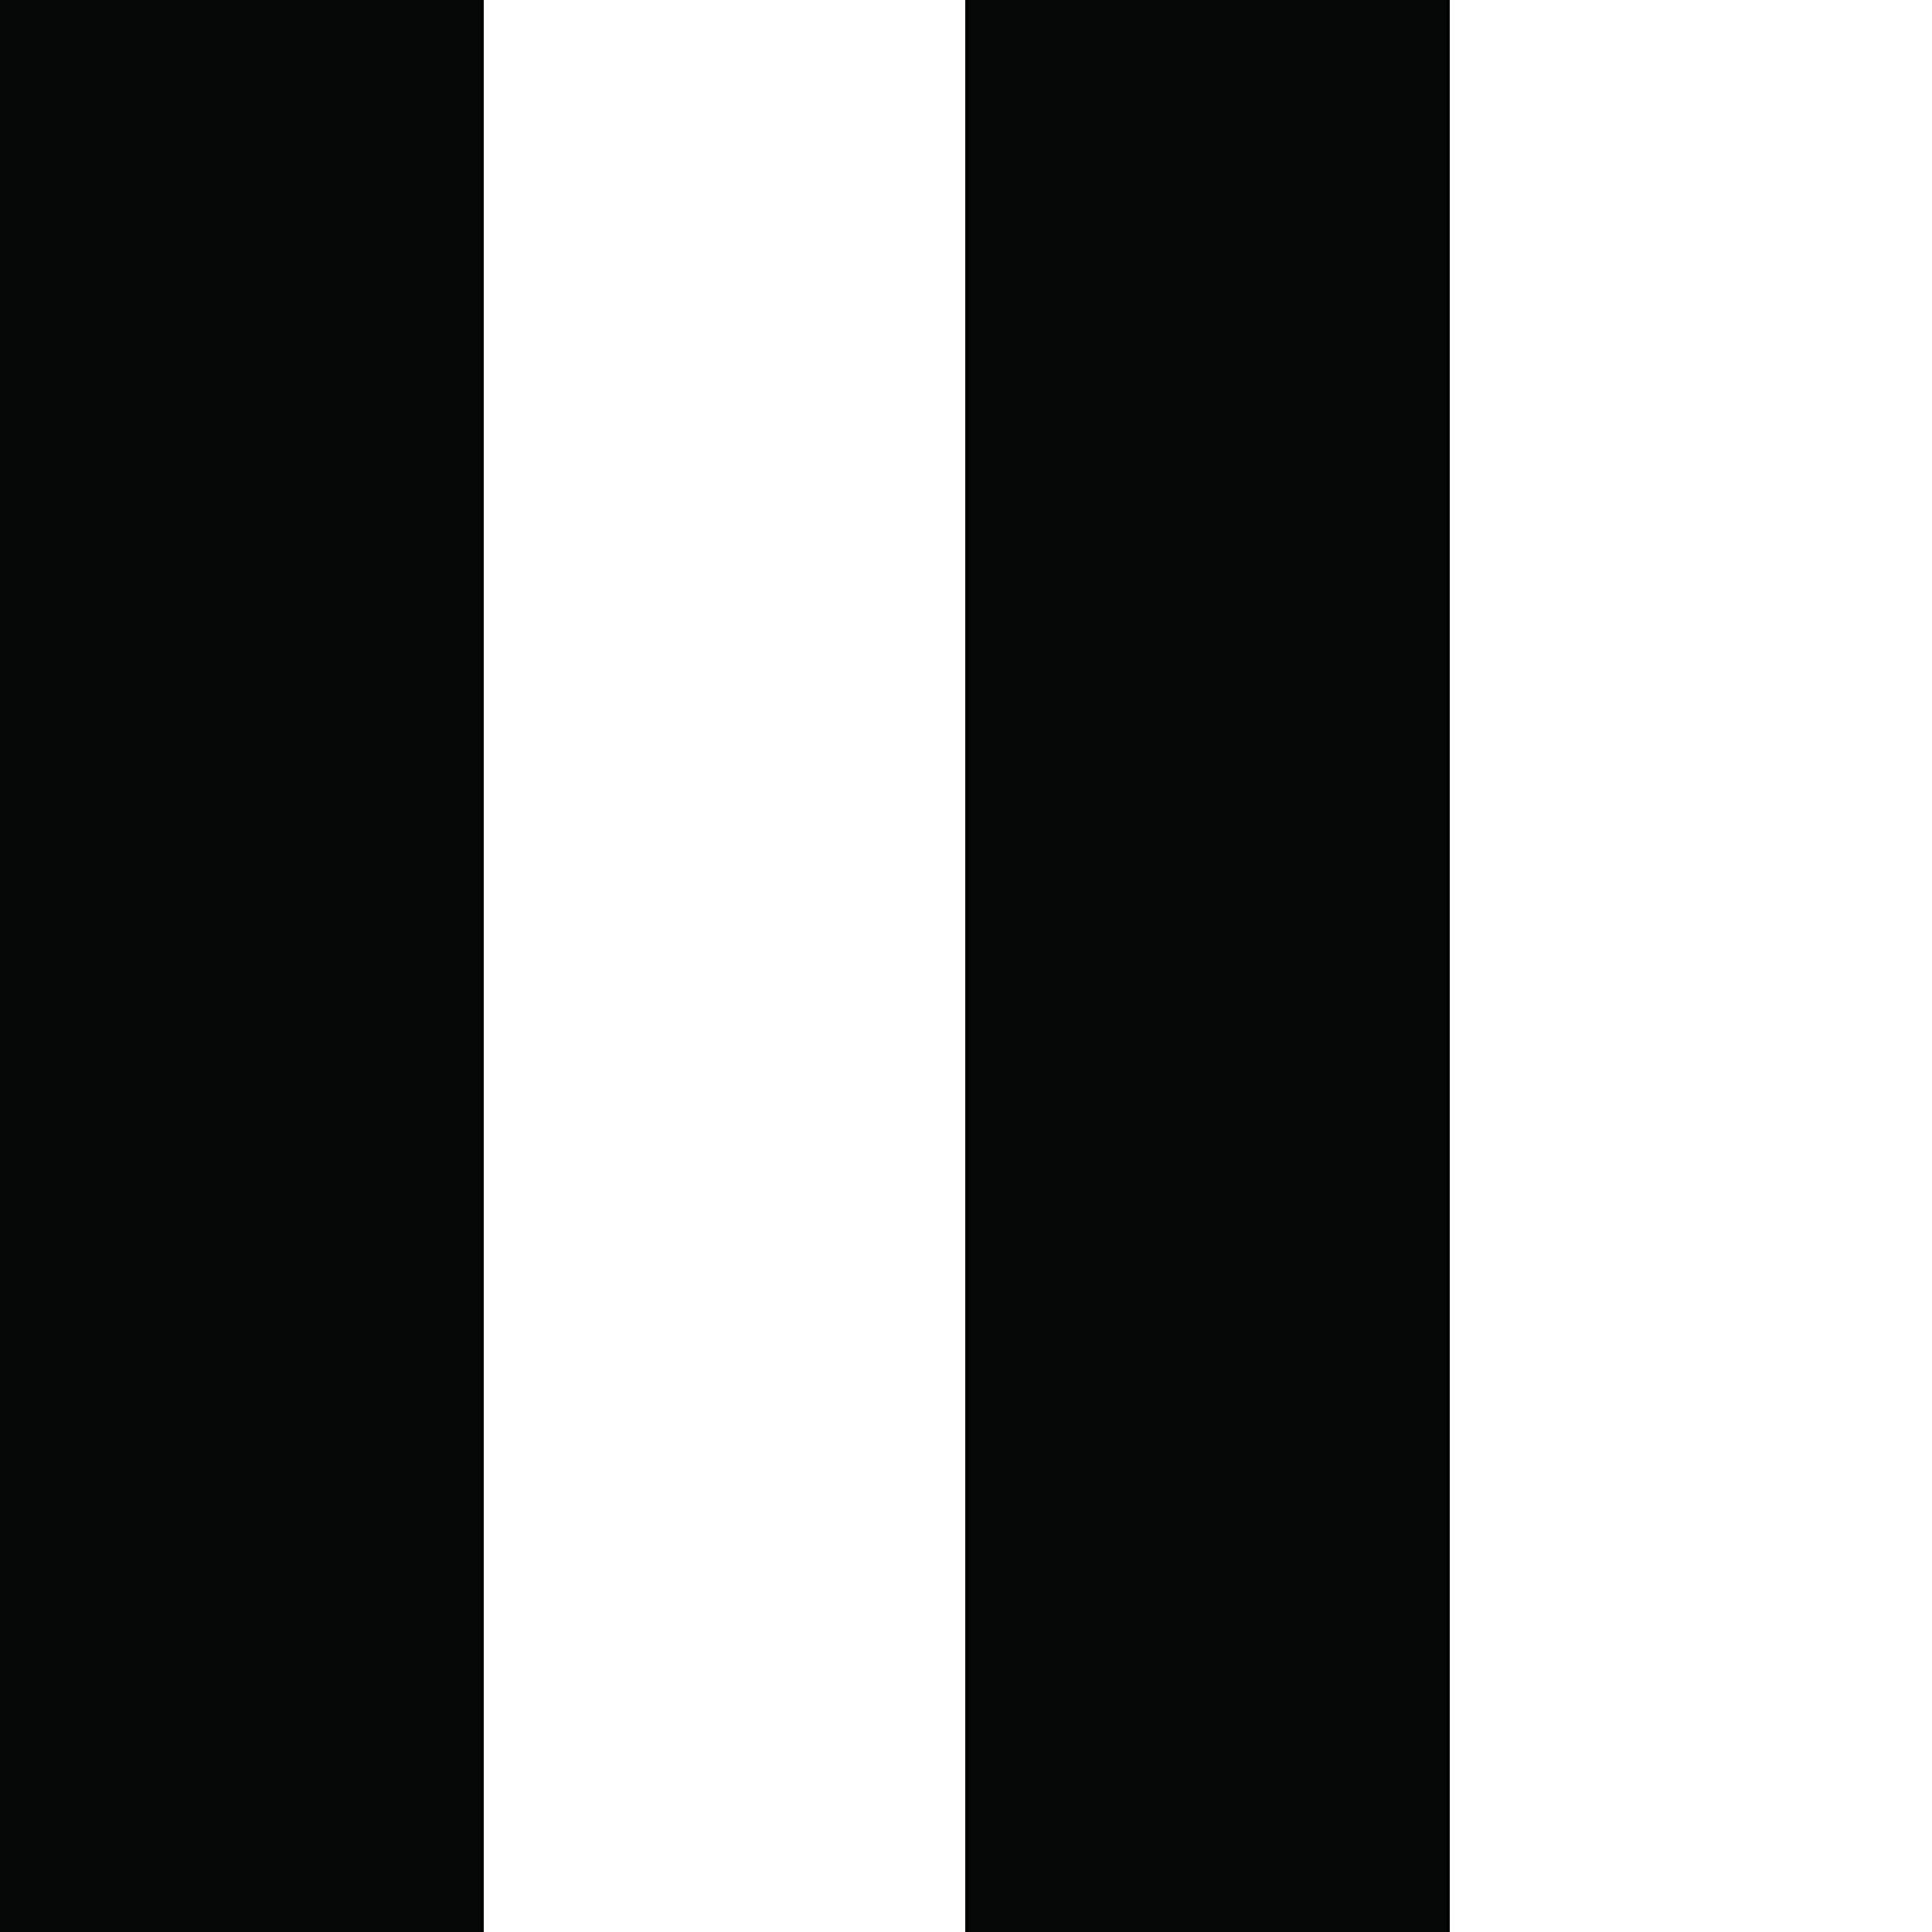 REPEEL RP436 Removable Wallpaper, Stripe, Black & White